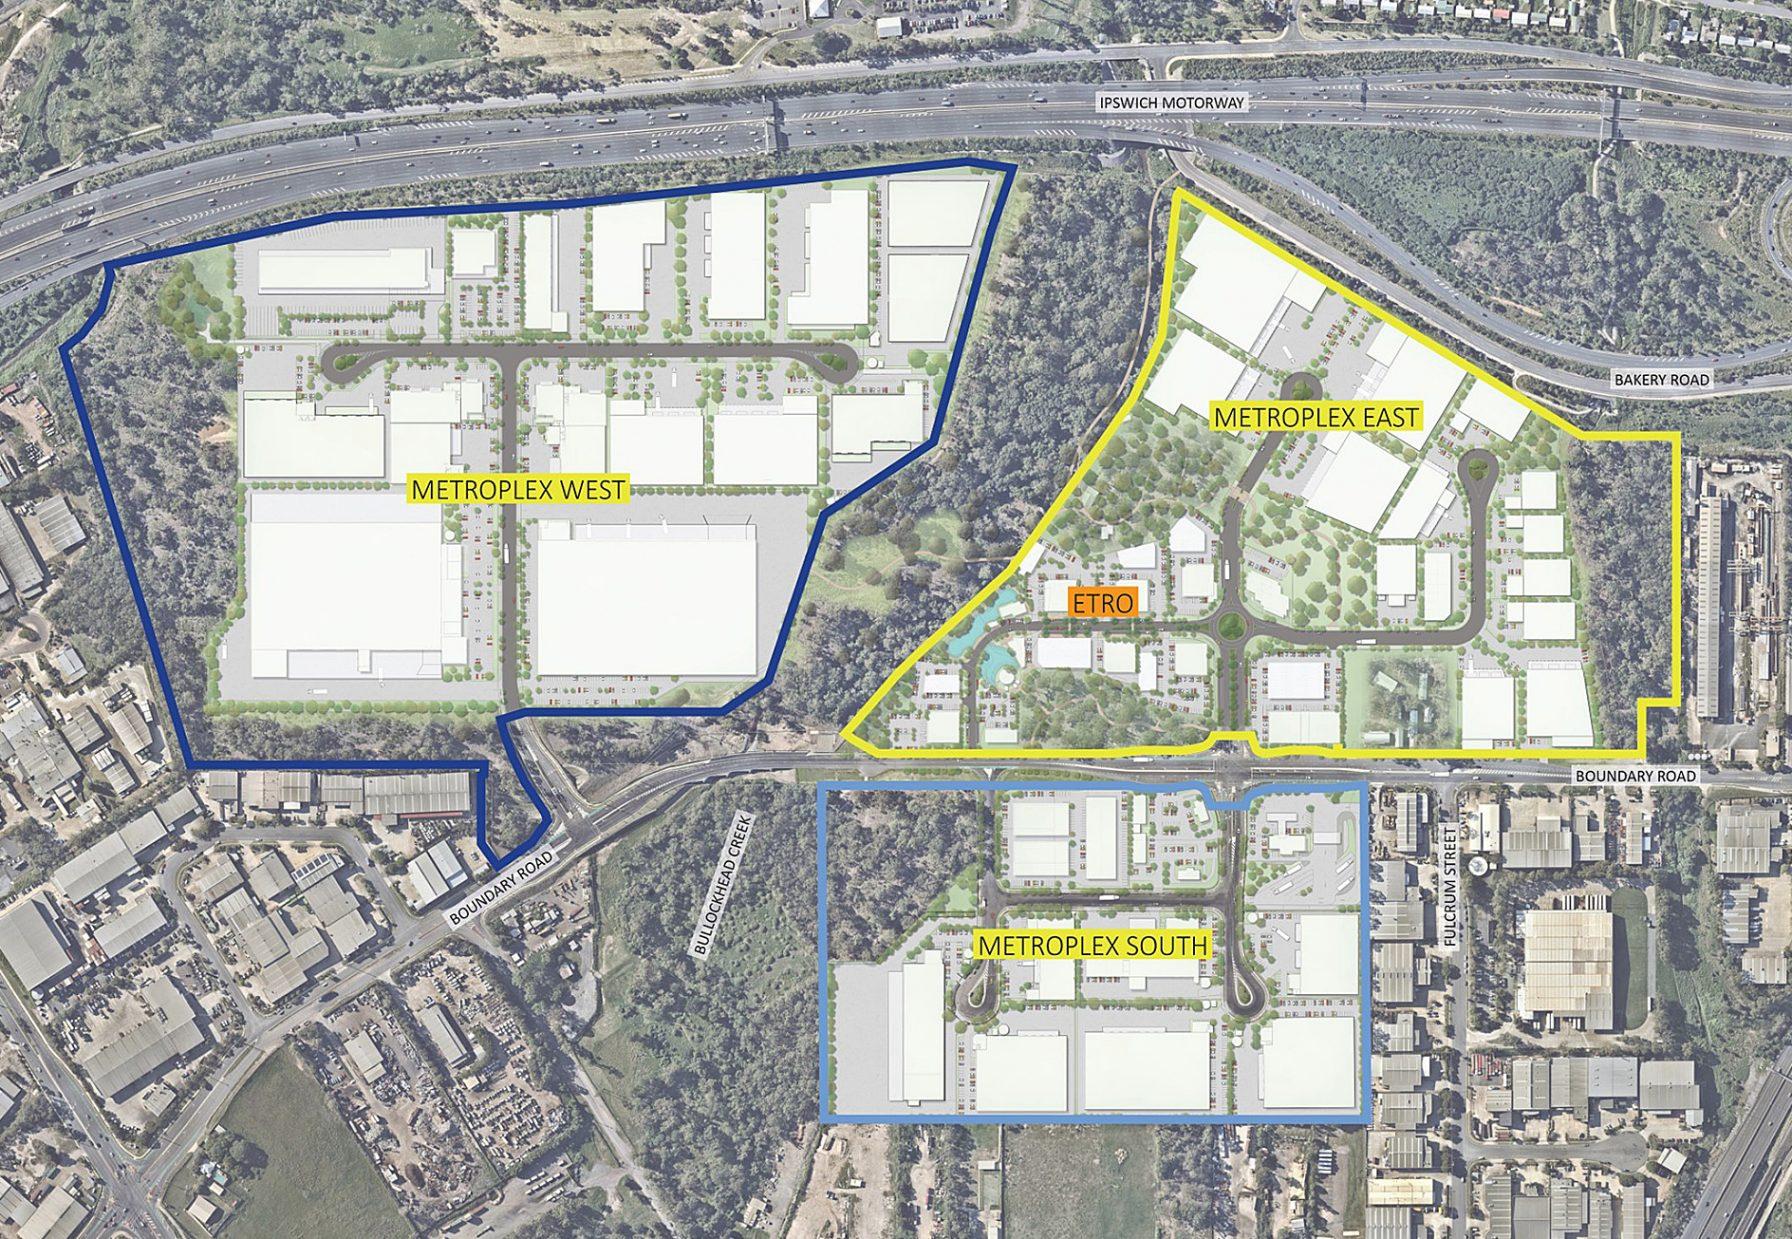 Metroplex Westgate aerial of precinct plan